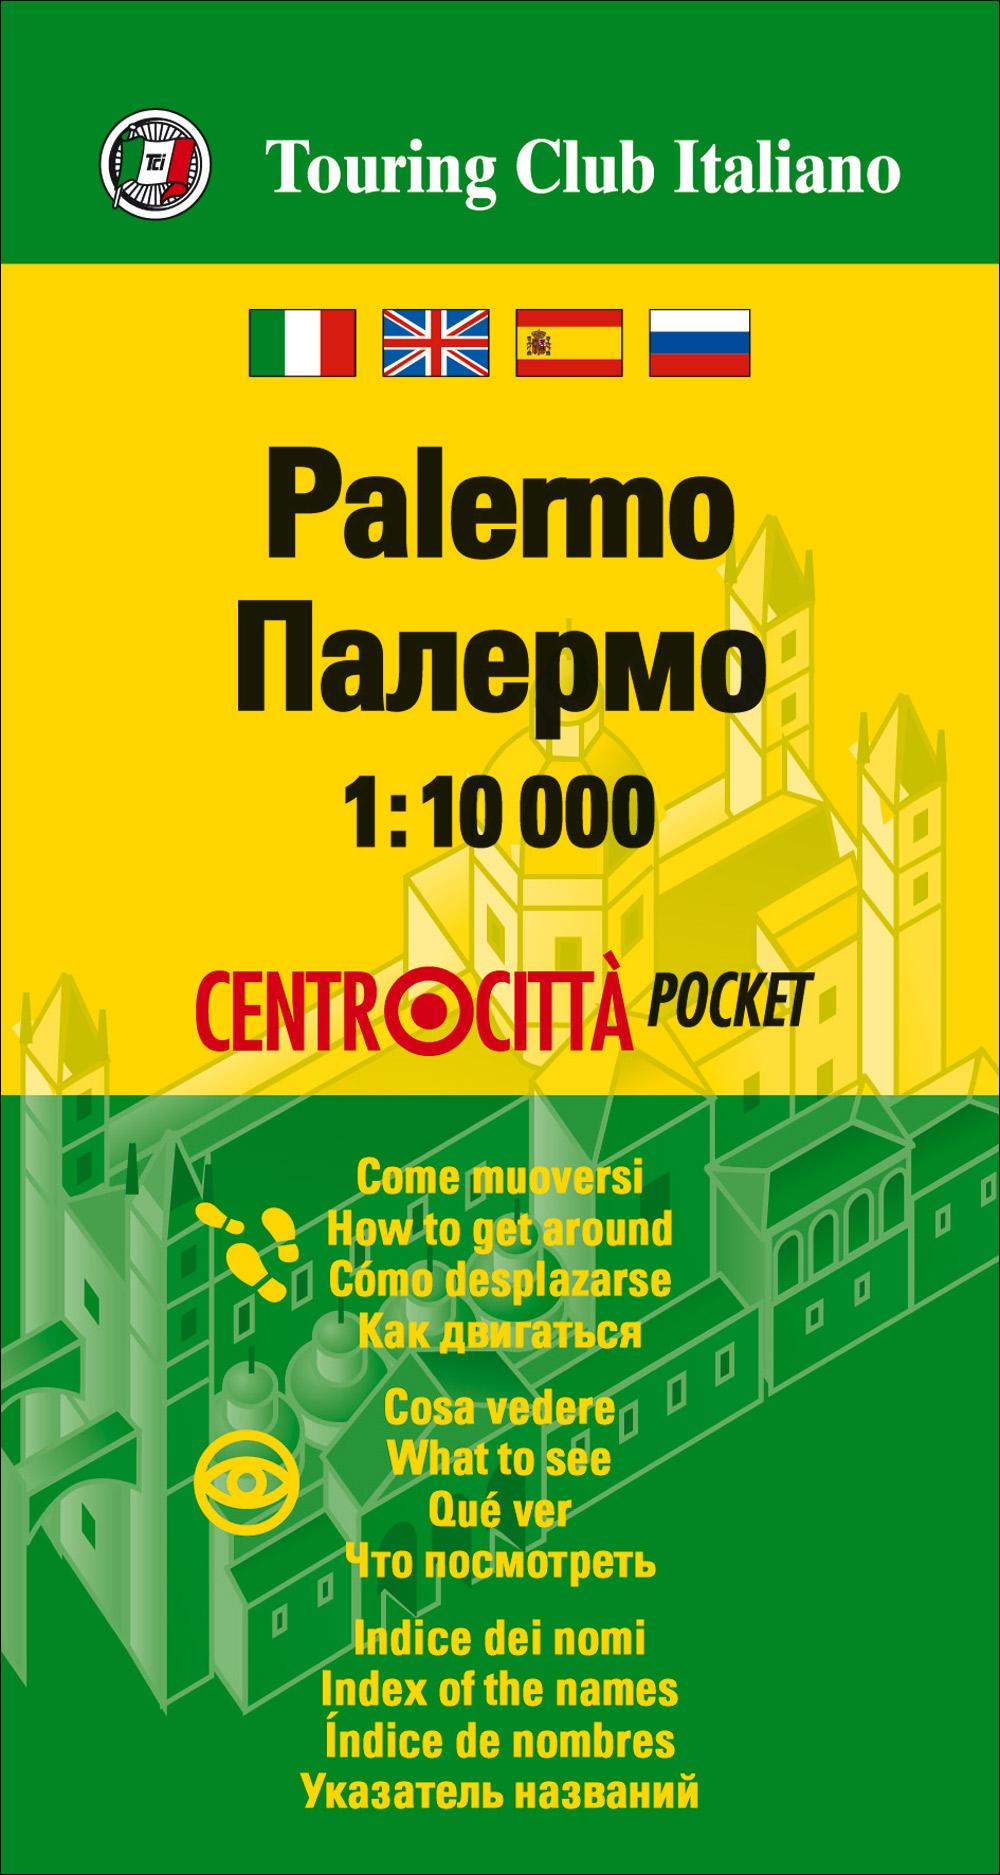 Palermo 1:10.000